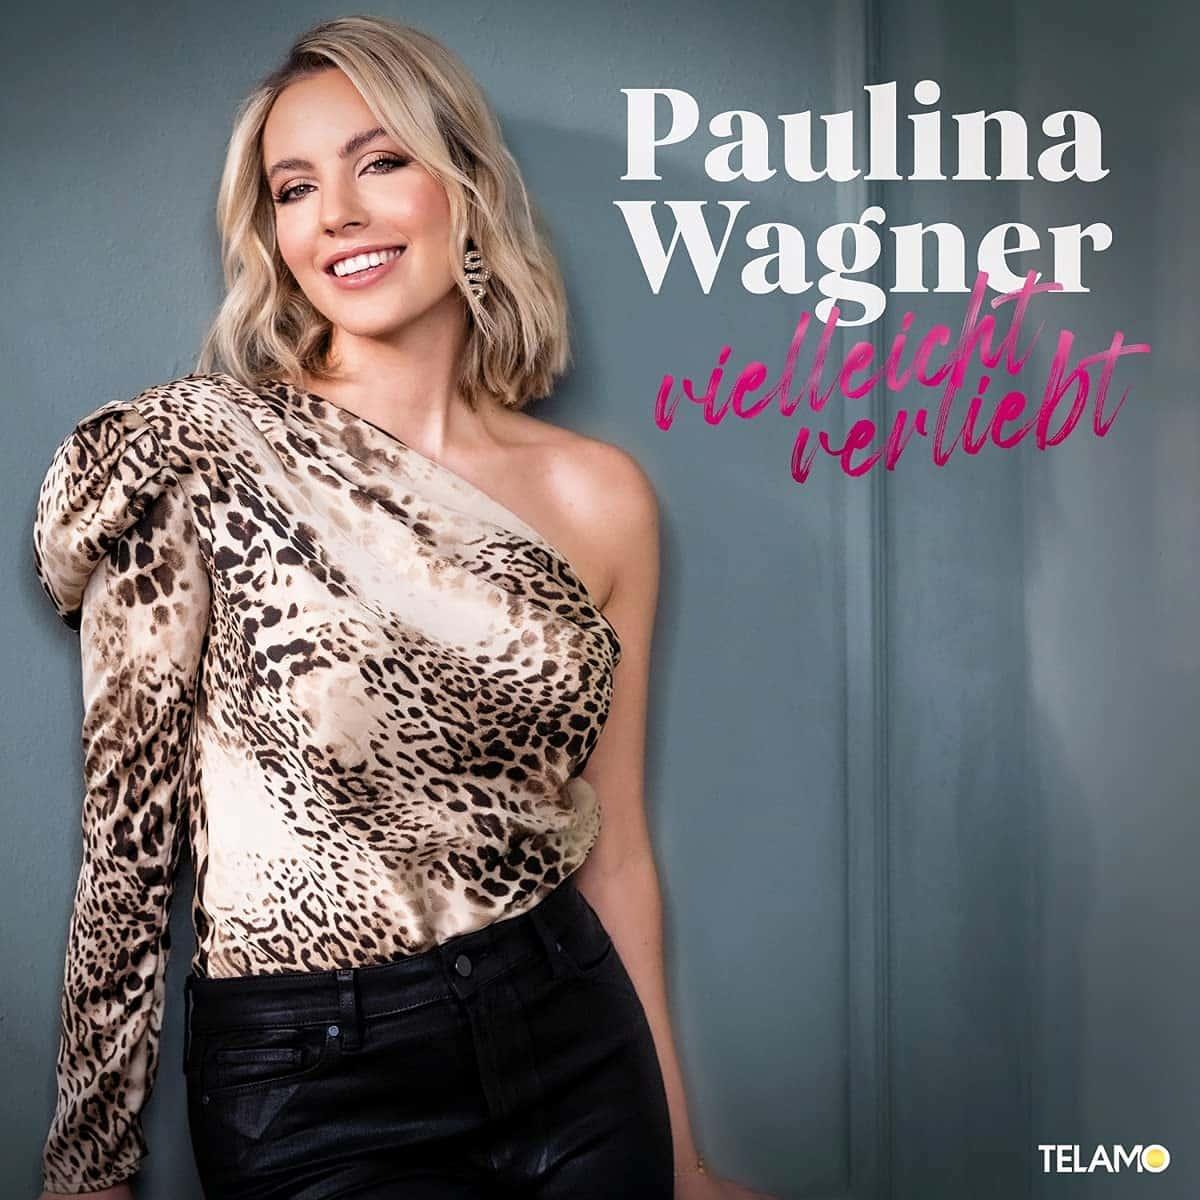 Paulina Wagner CD Vielleicht verliebt 2021